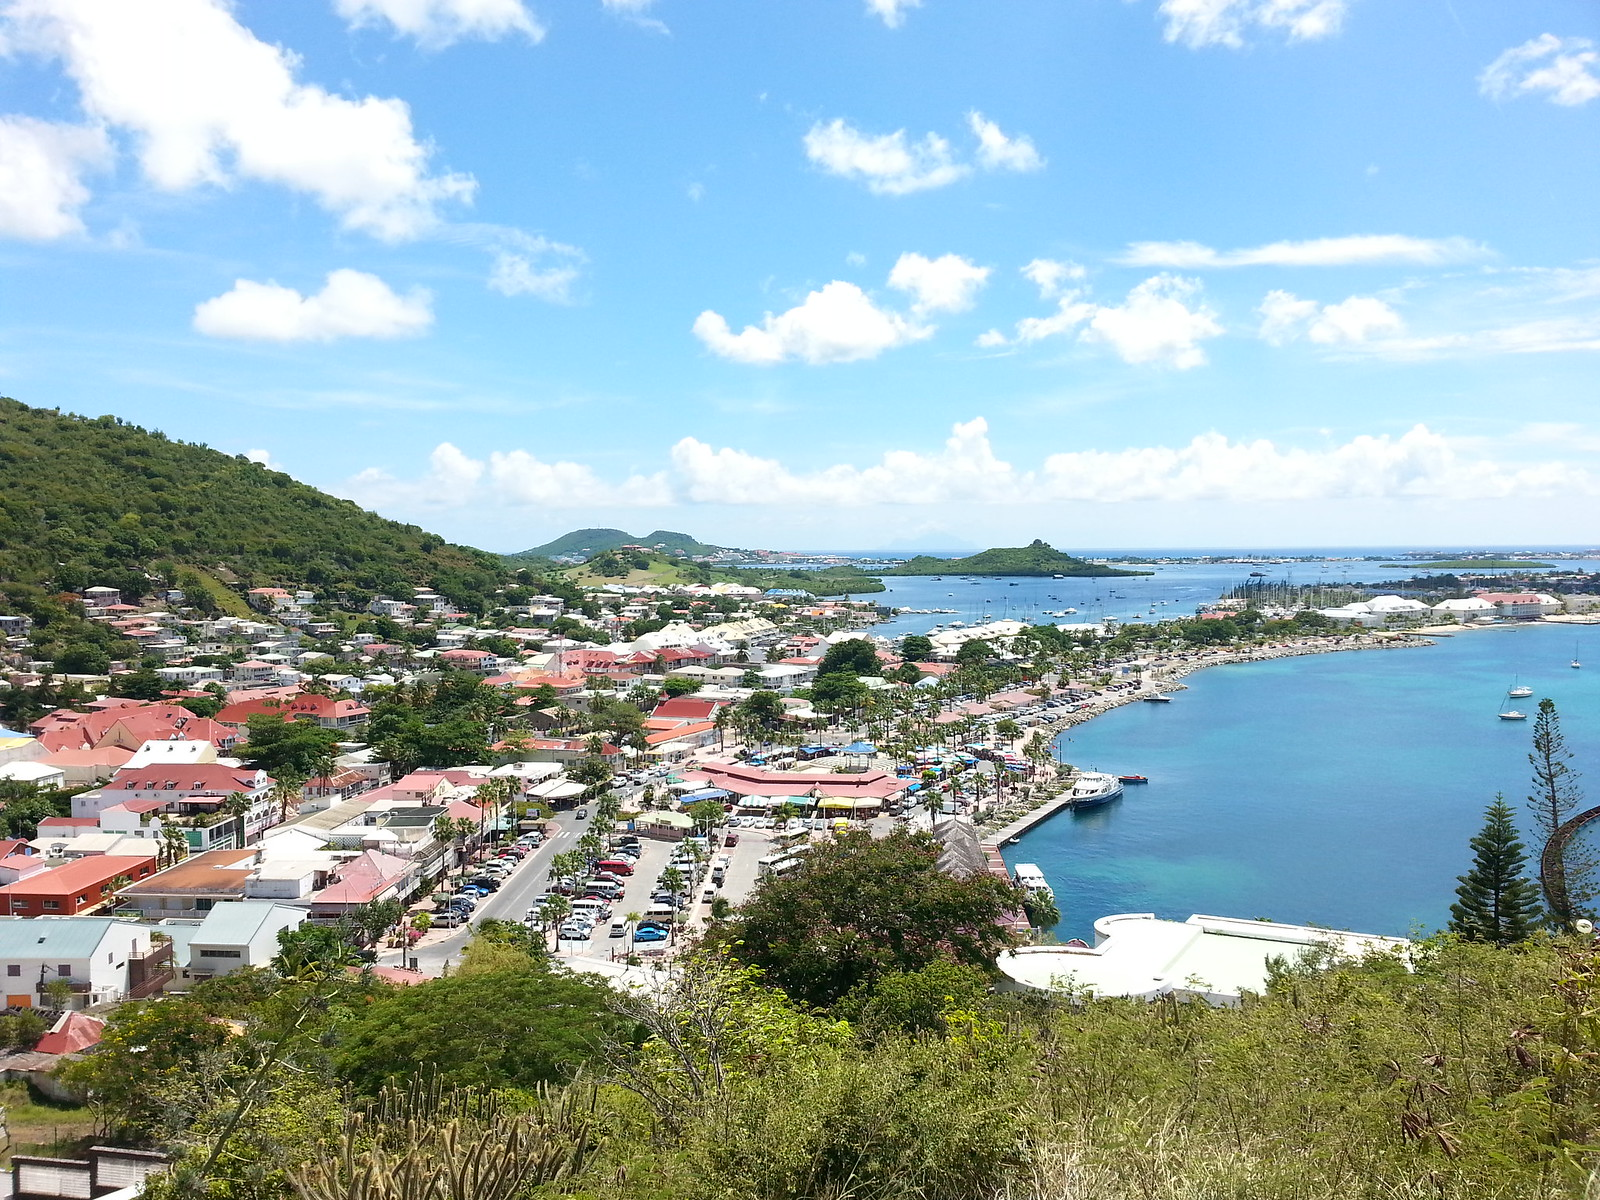 Marigot, St. Martin (French side)